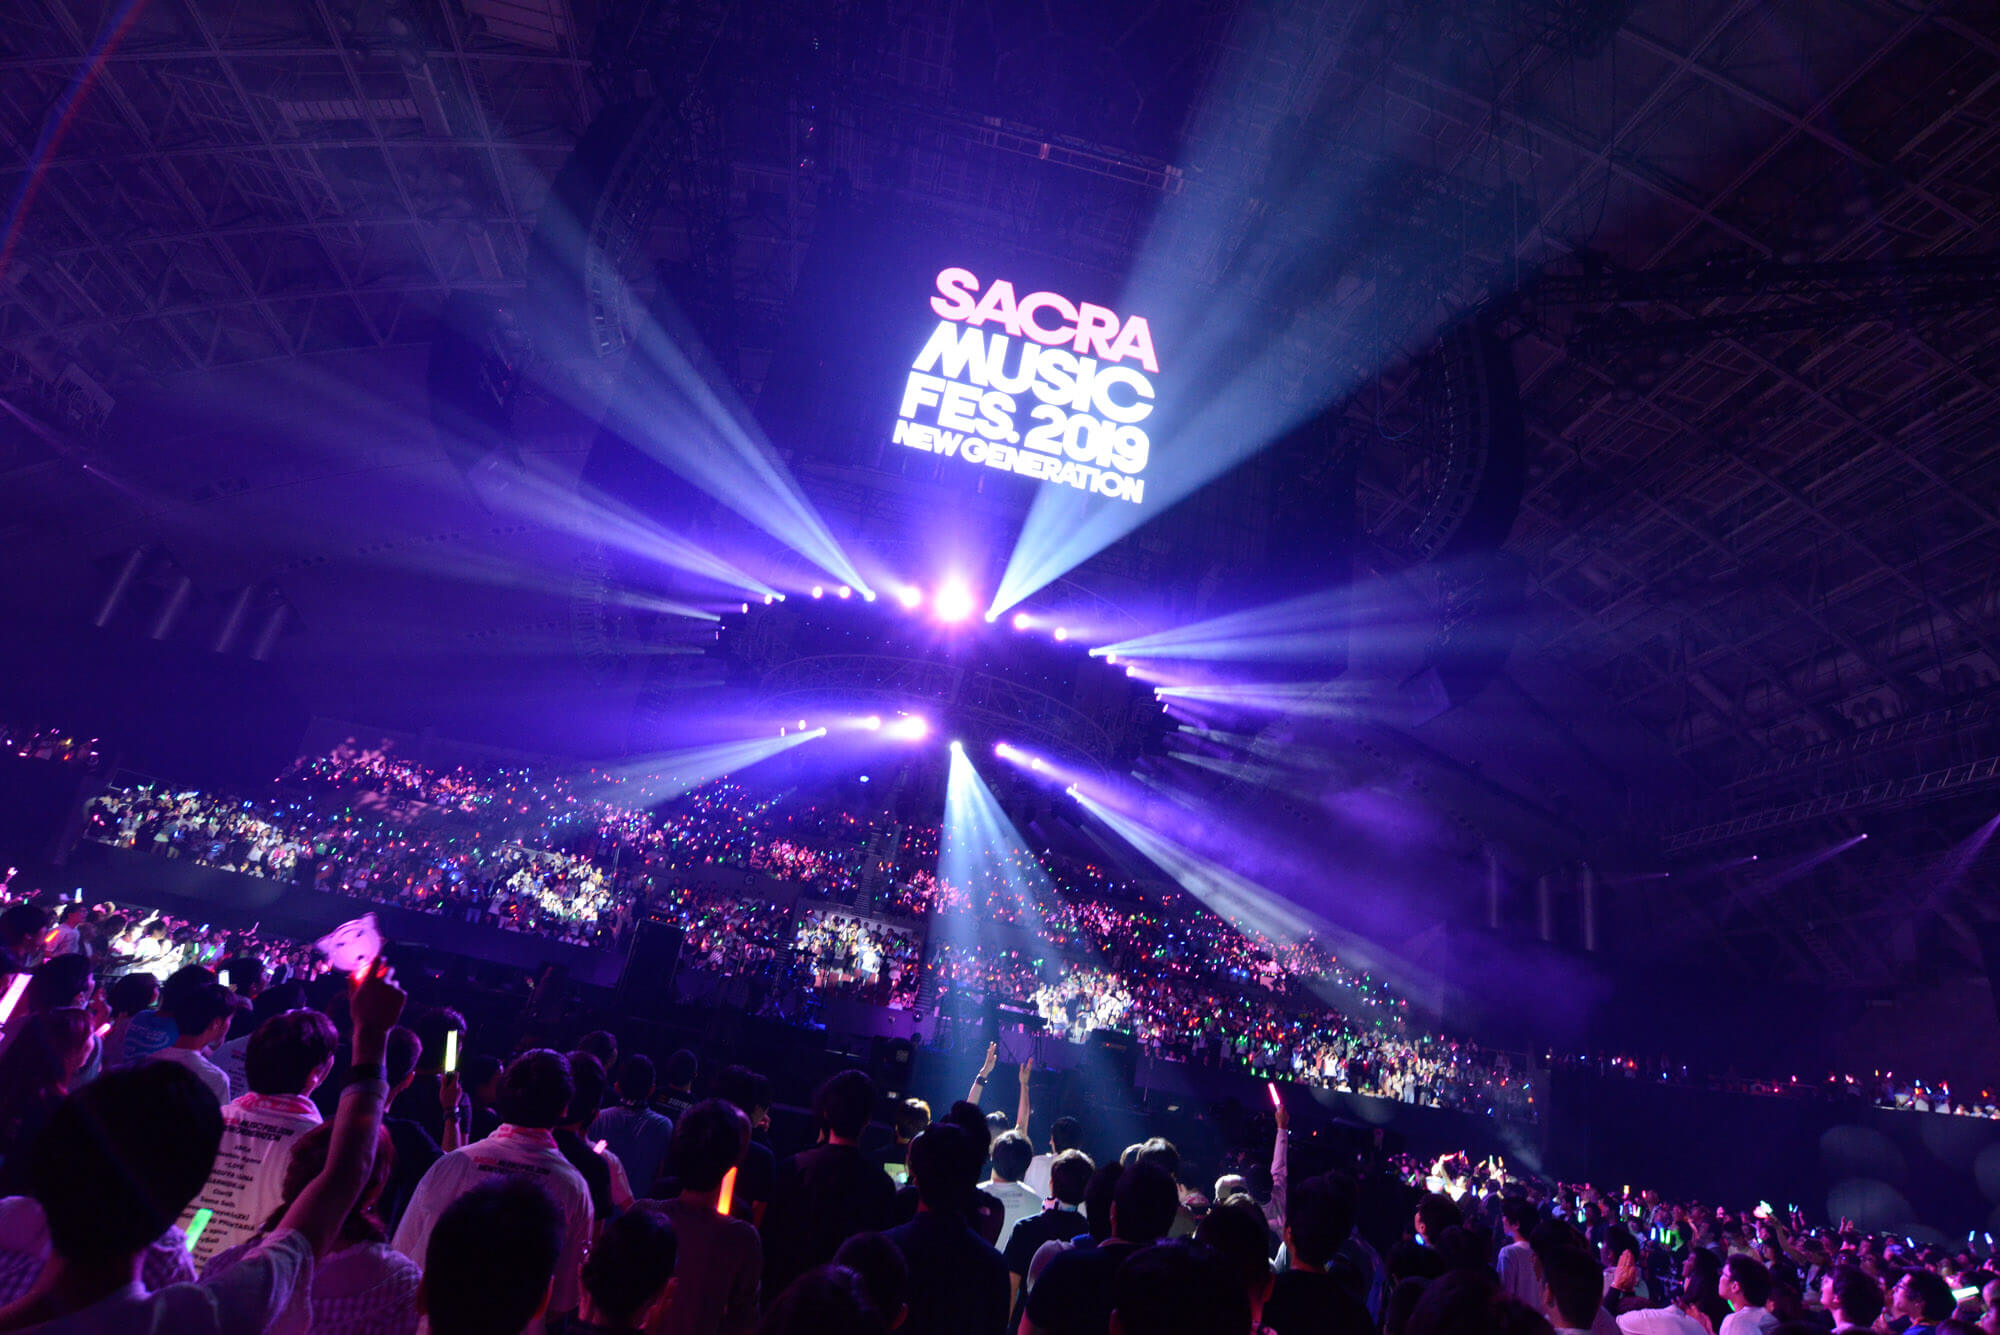 SACRA MUSIC FES. 2019 -NEW GENERATION- 桜ミュージックフェス ニュージェネレーション00_SACRAMUSICFES